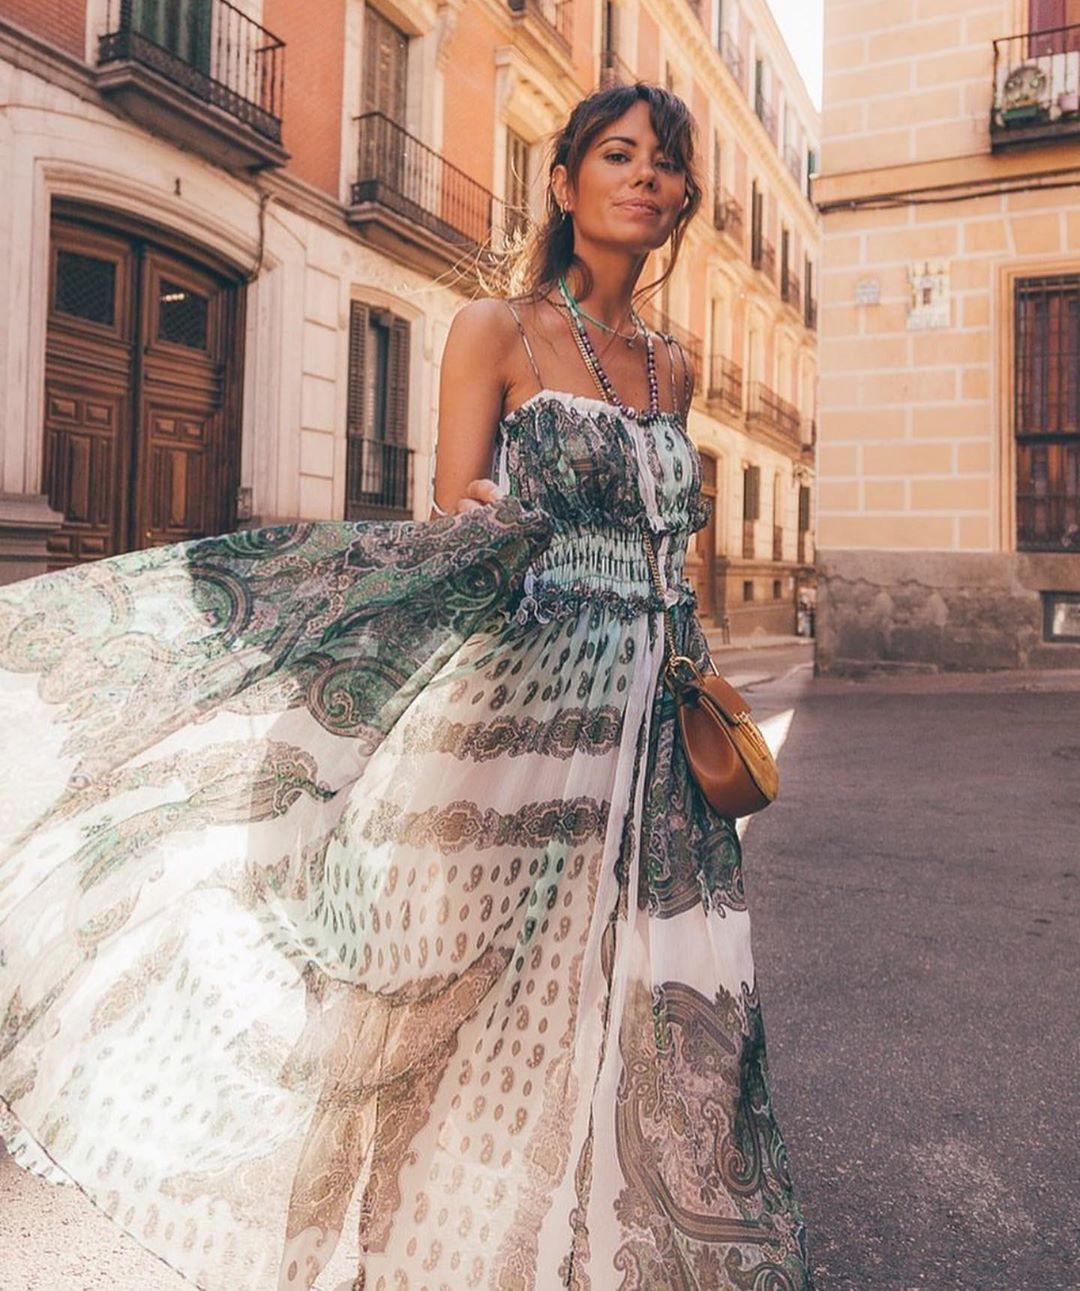 dress with print and straps de Zara sur zaraaddiction